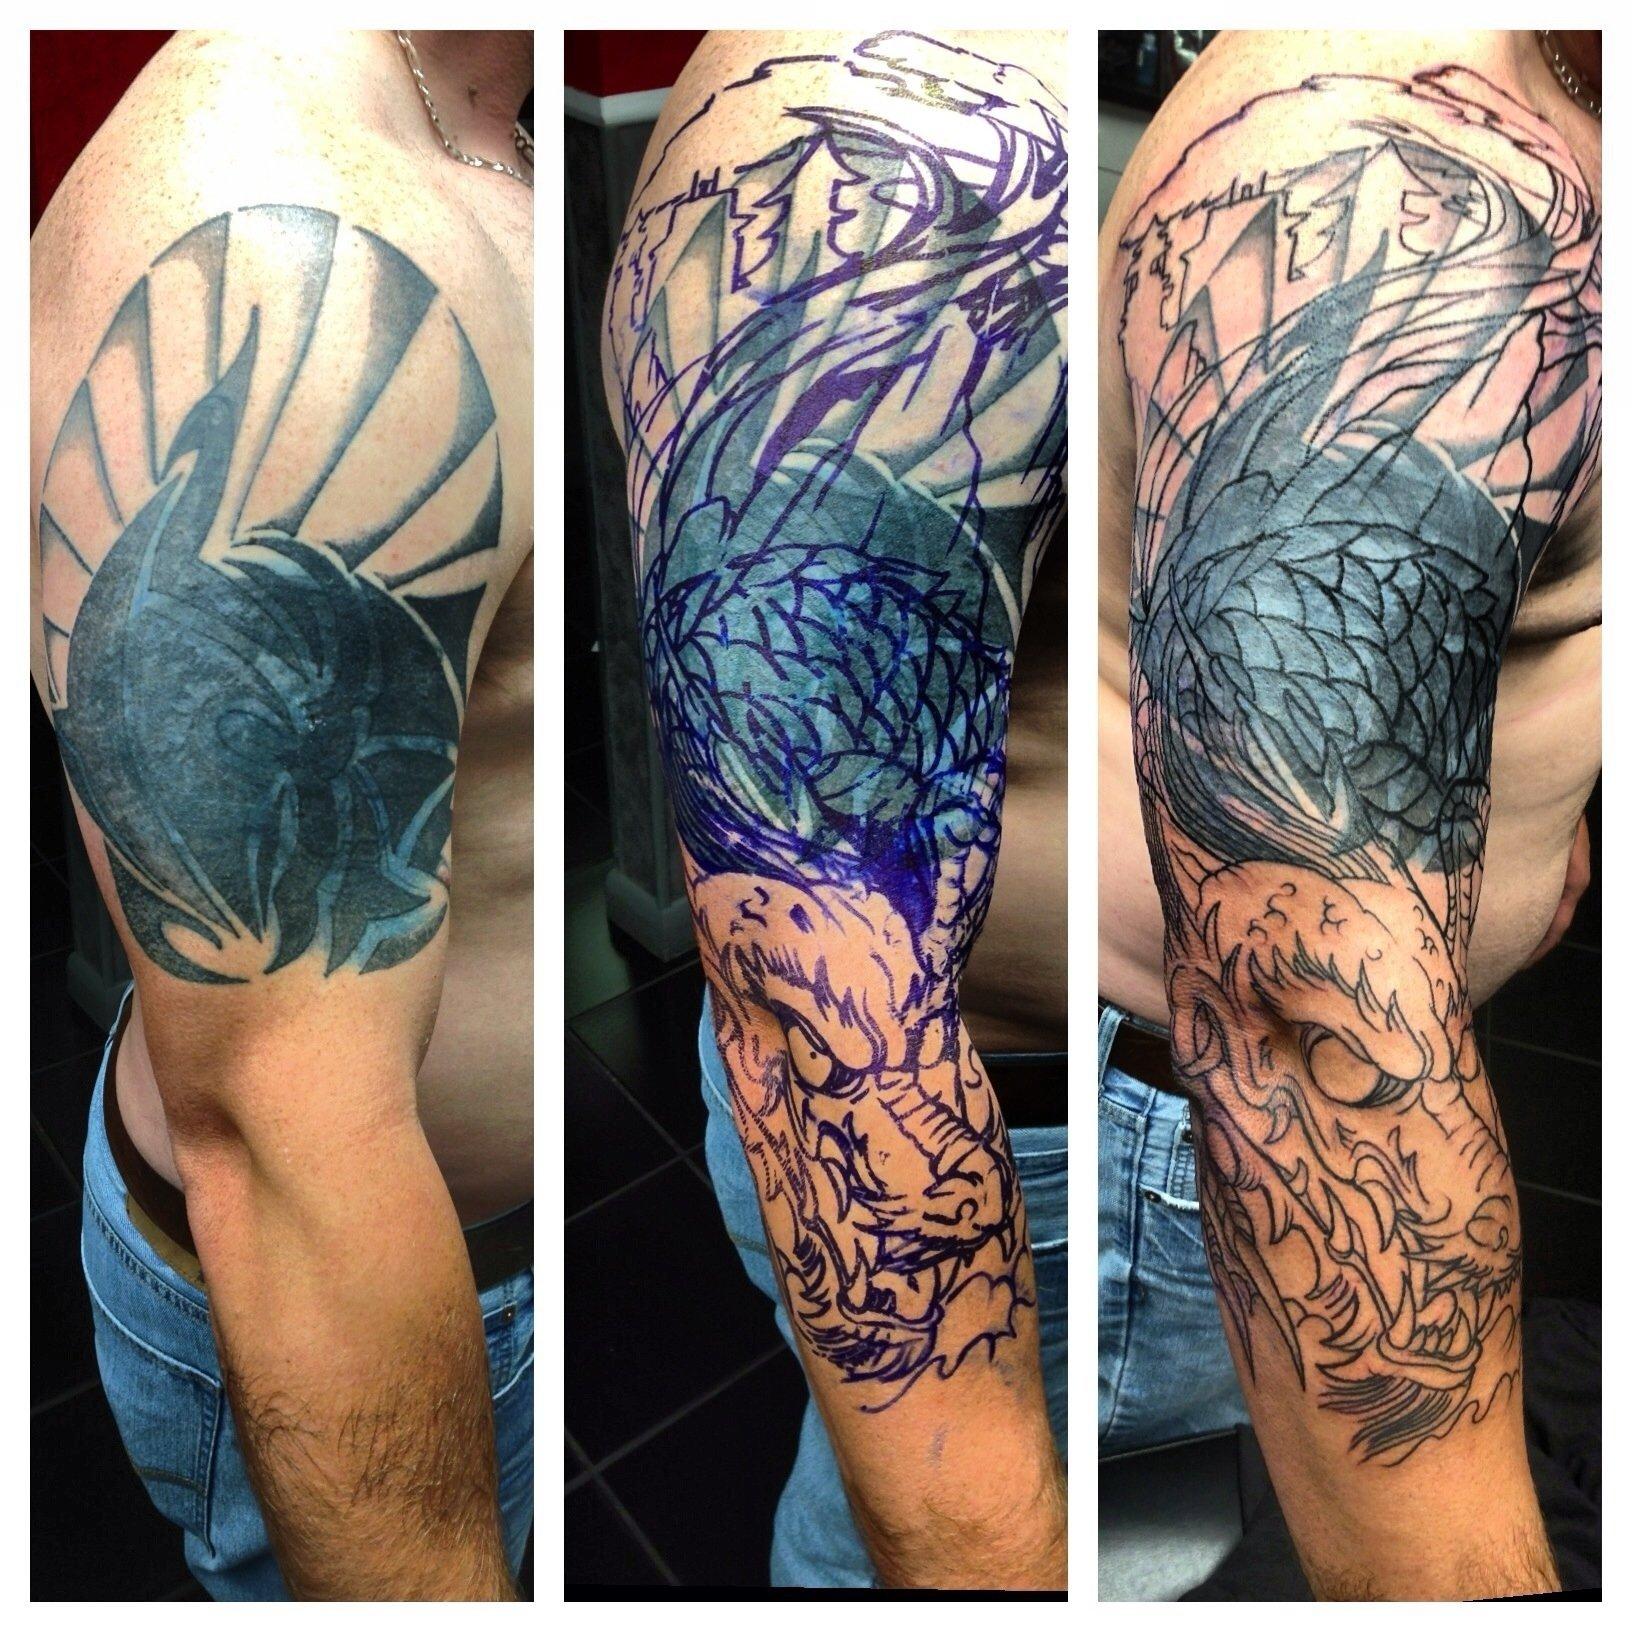 10 Stylish Tribal Tattoo Cover Up Ideas tribal dragon tattoo designs tattoo ideas pictures tattoo ideas 1 2020